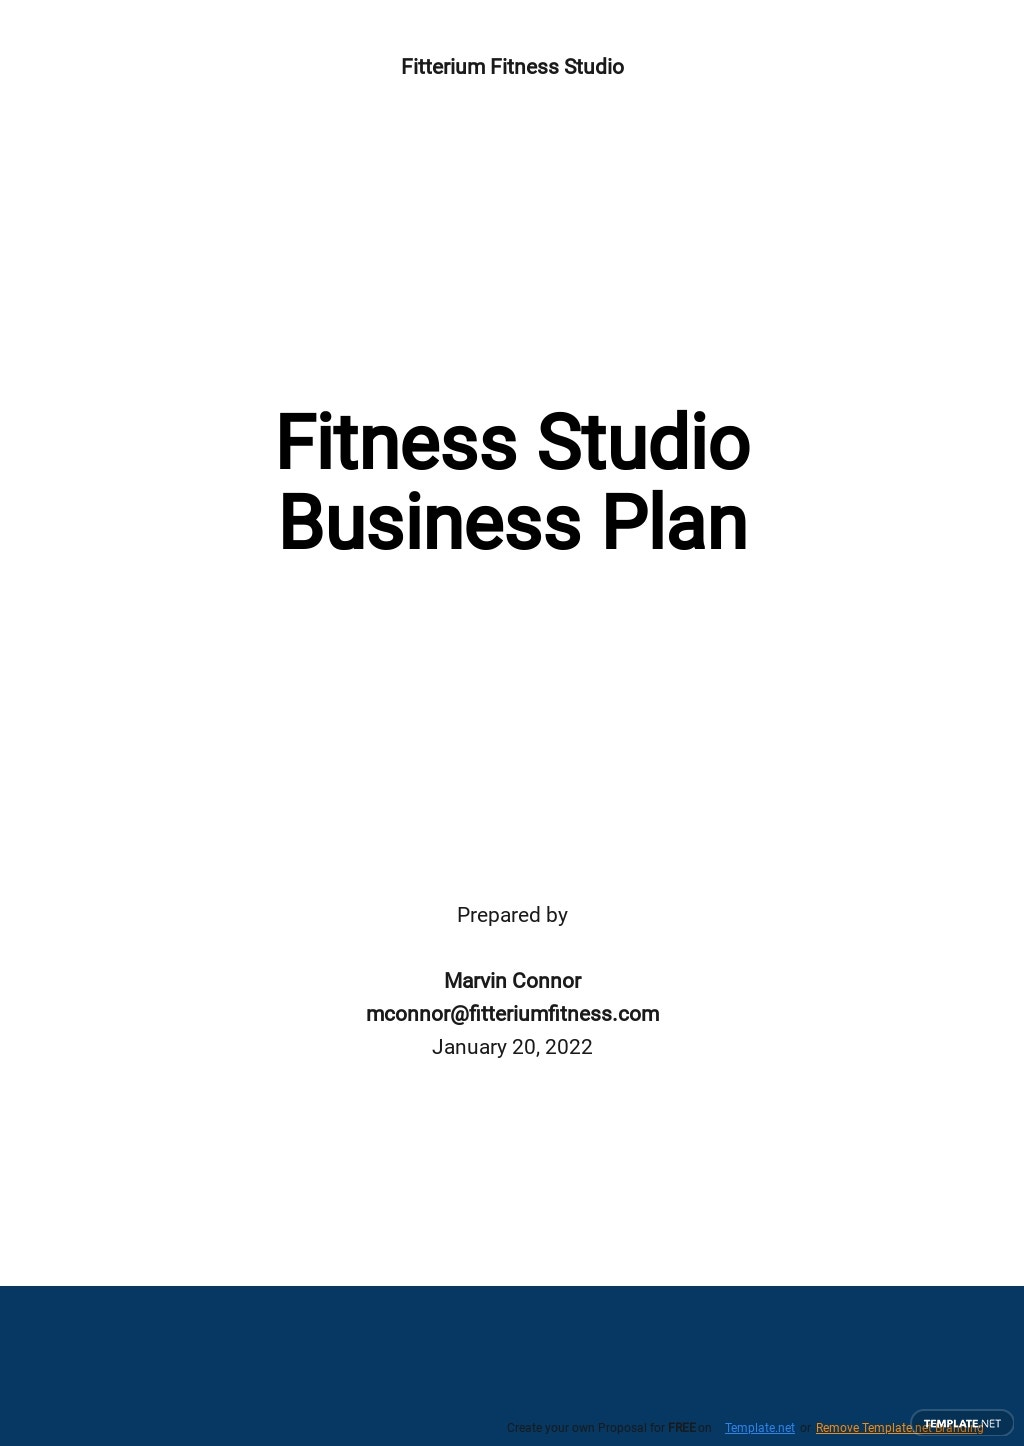 Fitness Studio Business Plan Template.jpe